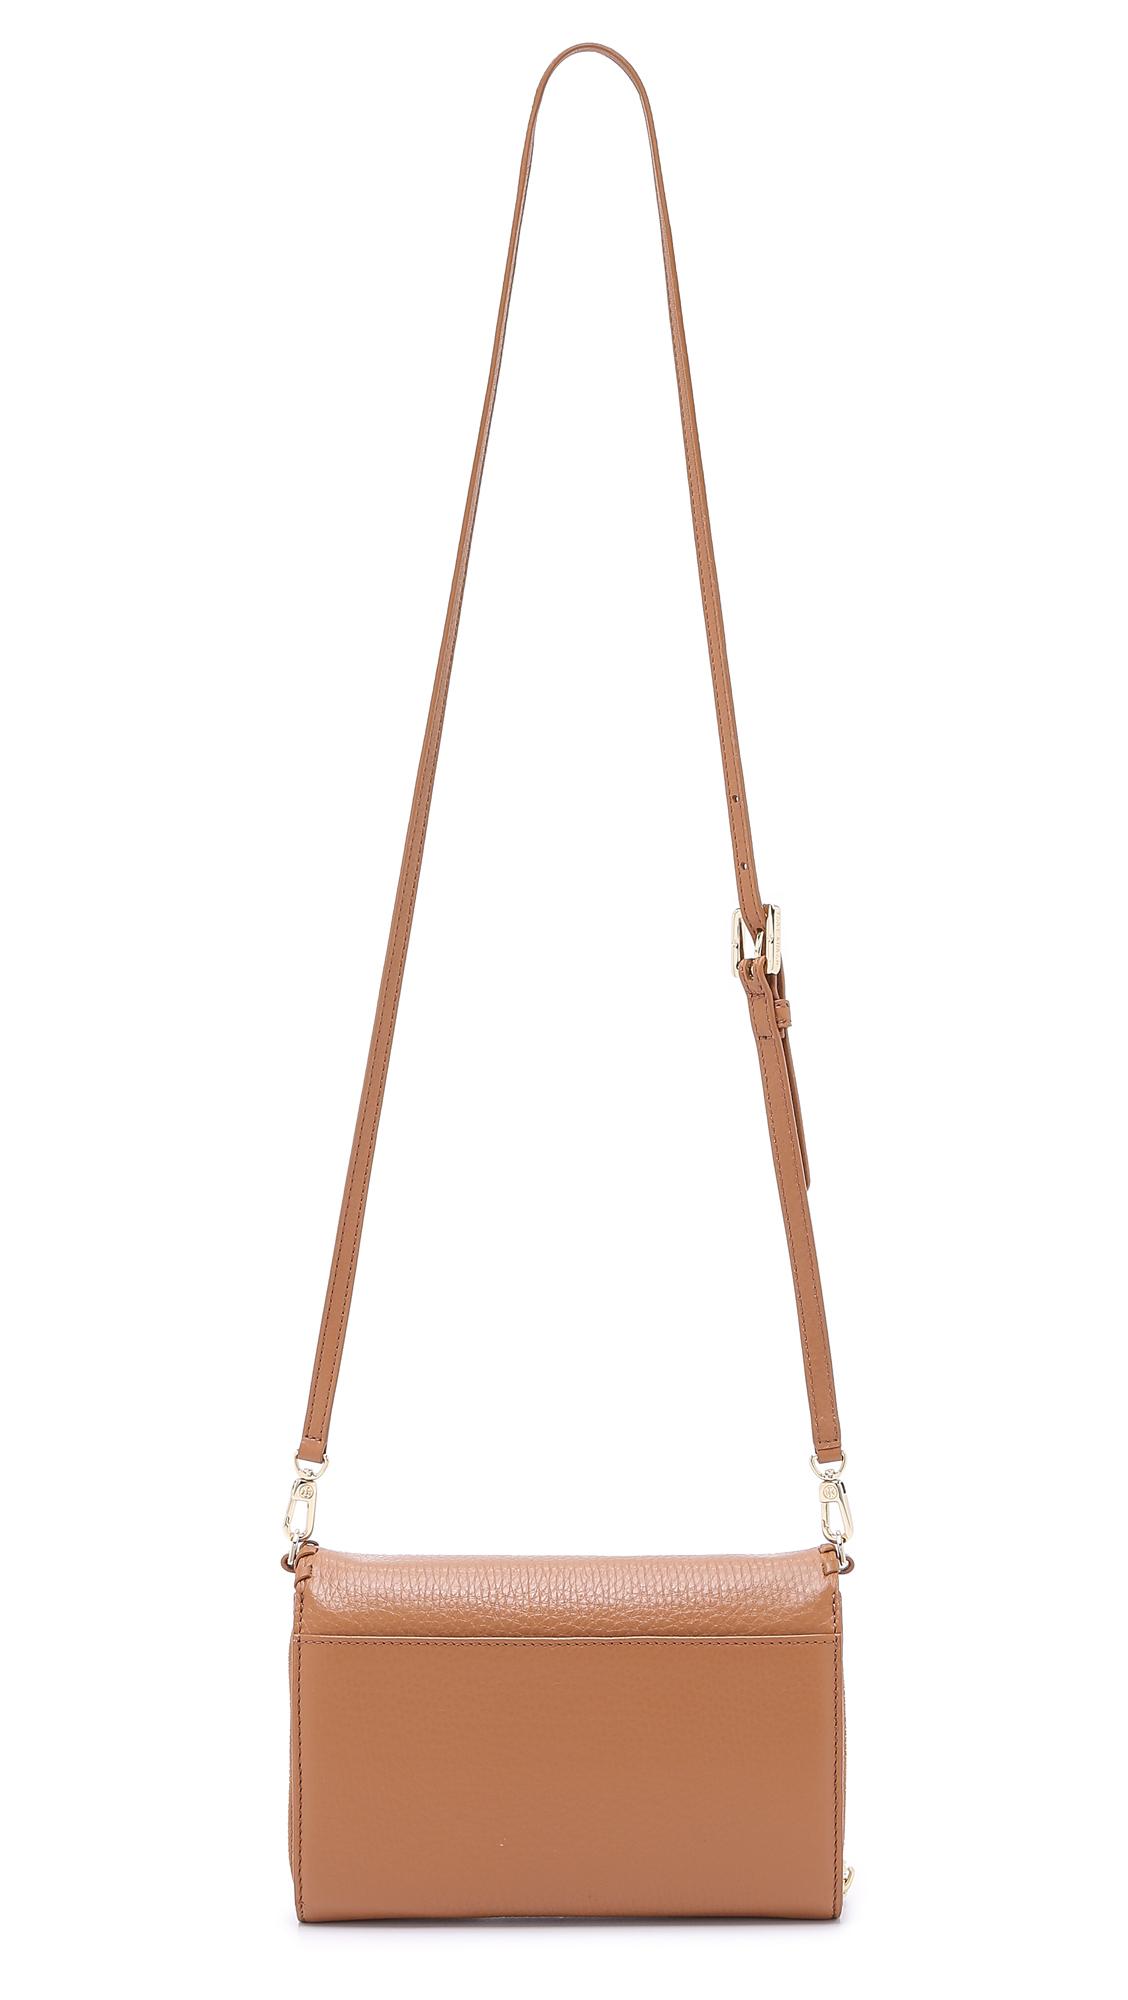 Lyst - Tory Burch Marion Flat Wallet Cross Body Bag